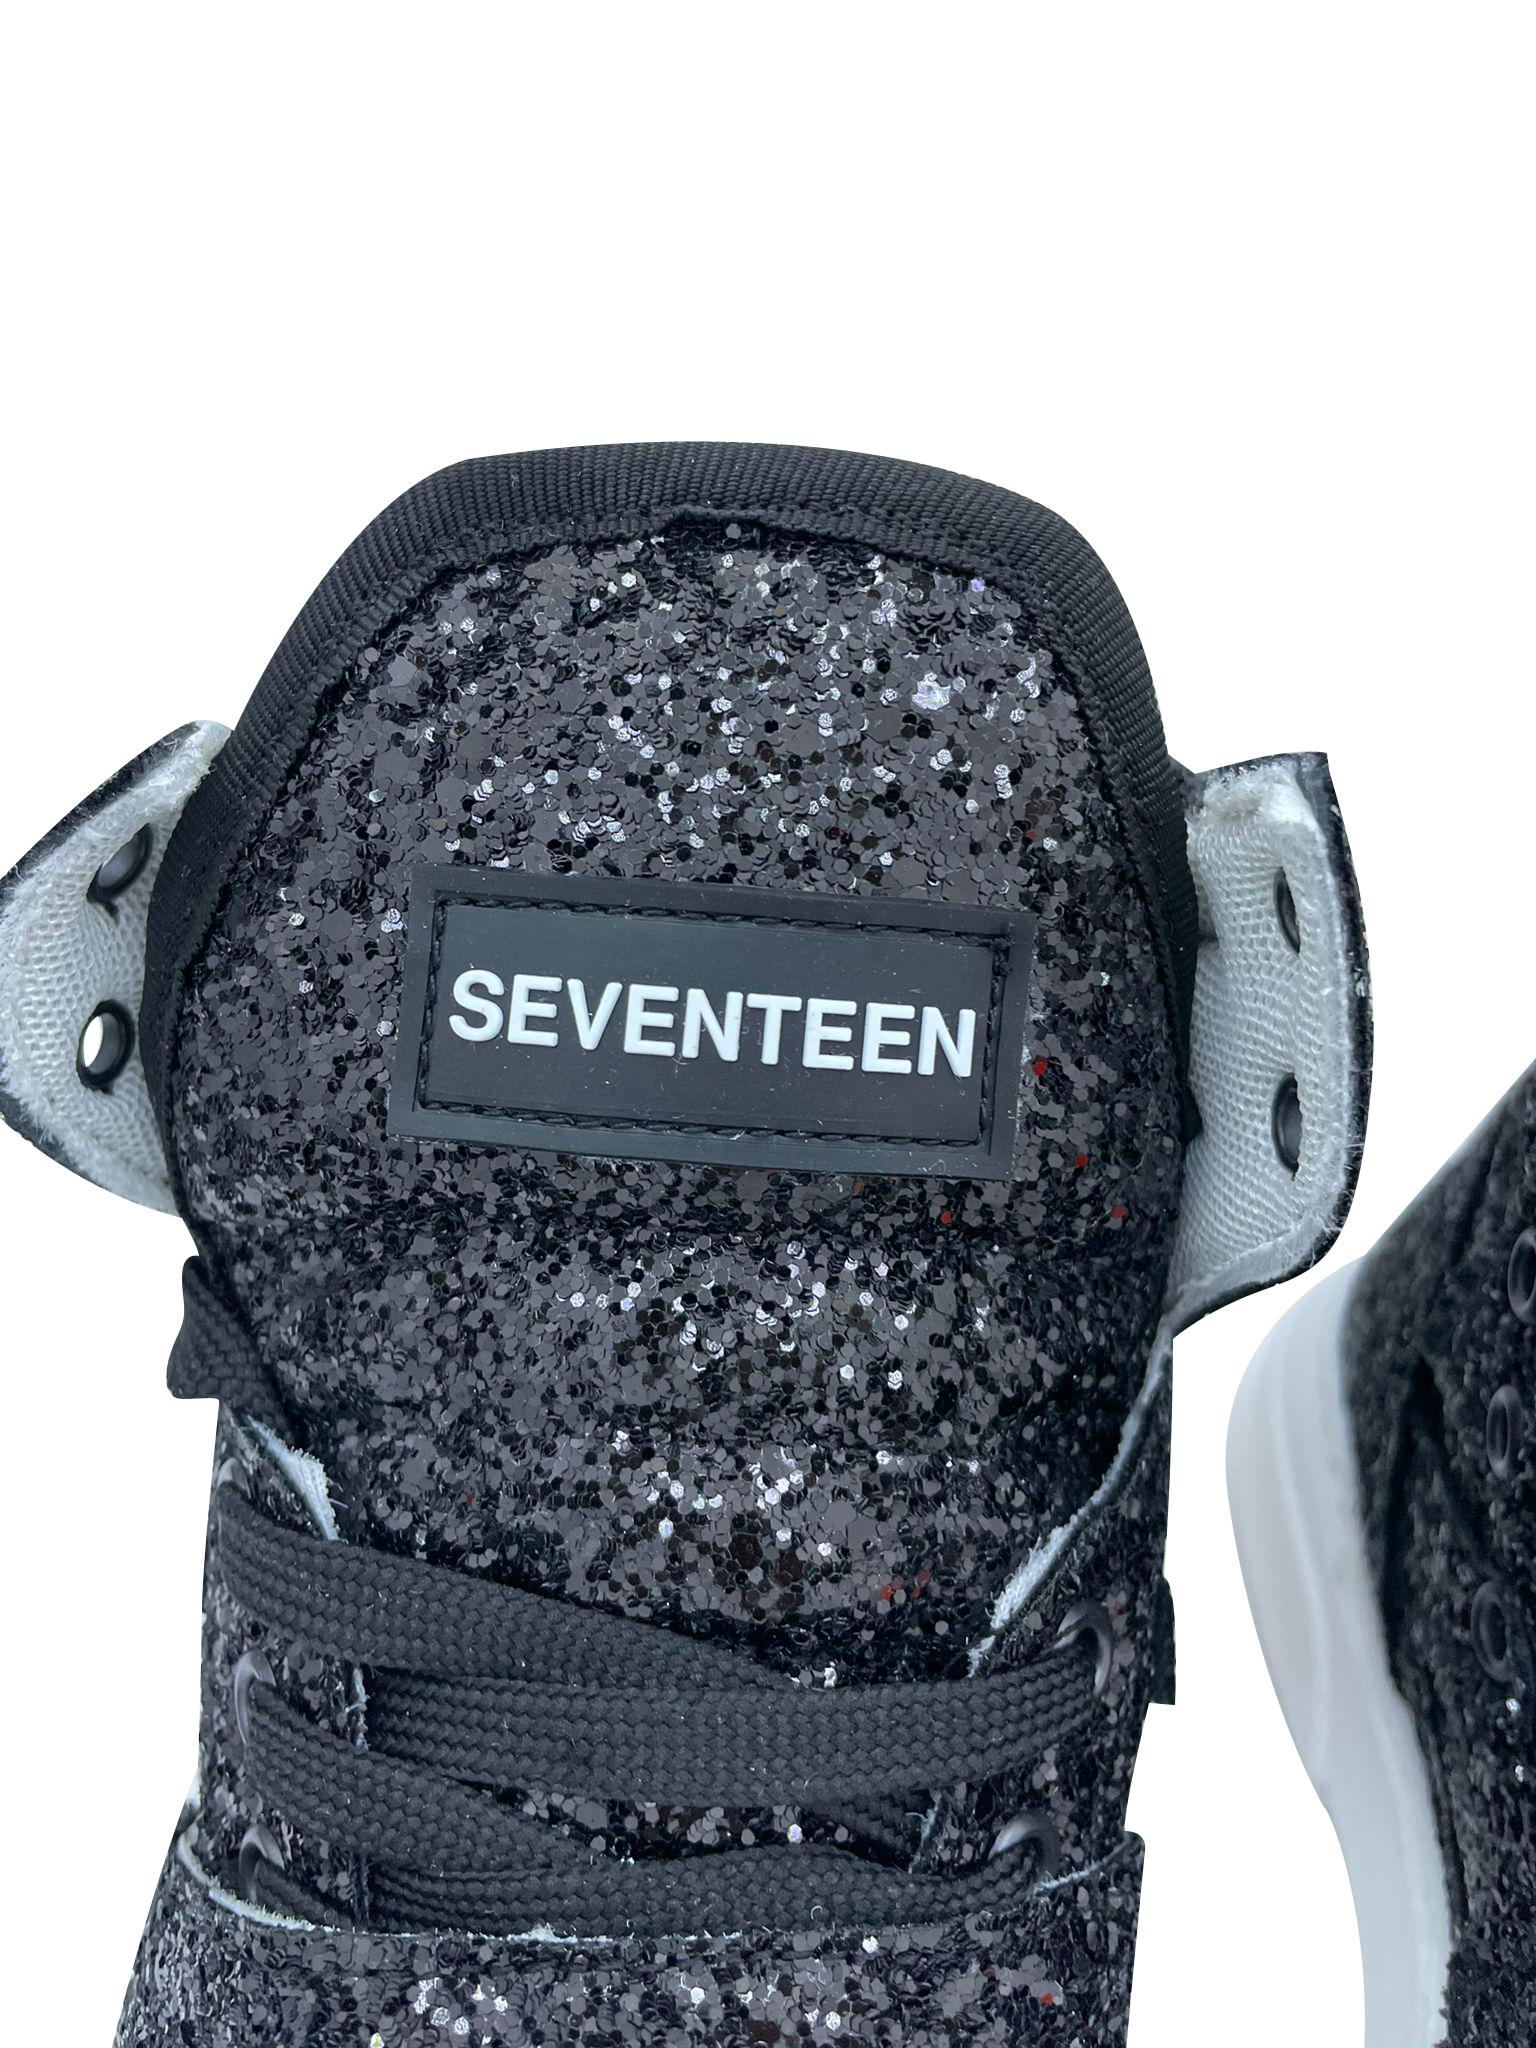 17 SEVENTEEN 017 GLITTER NERO 011